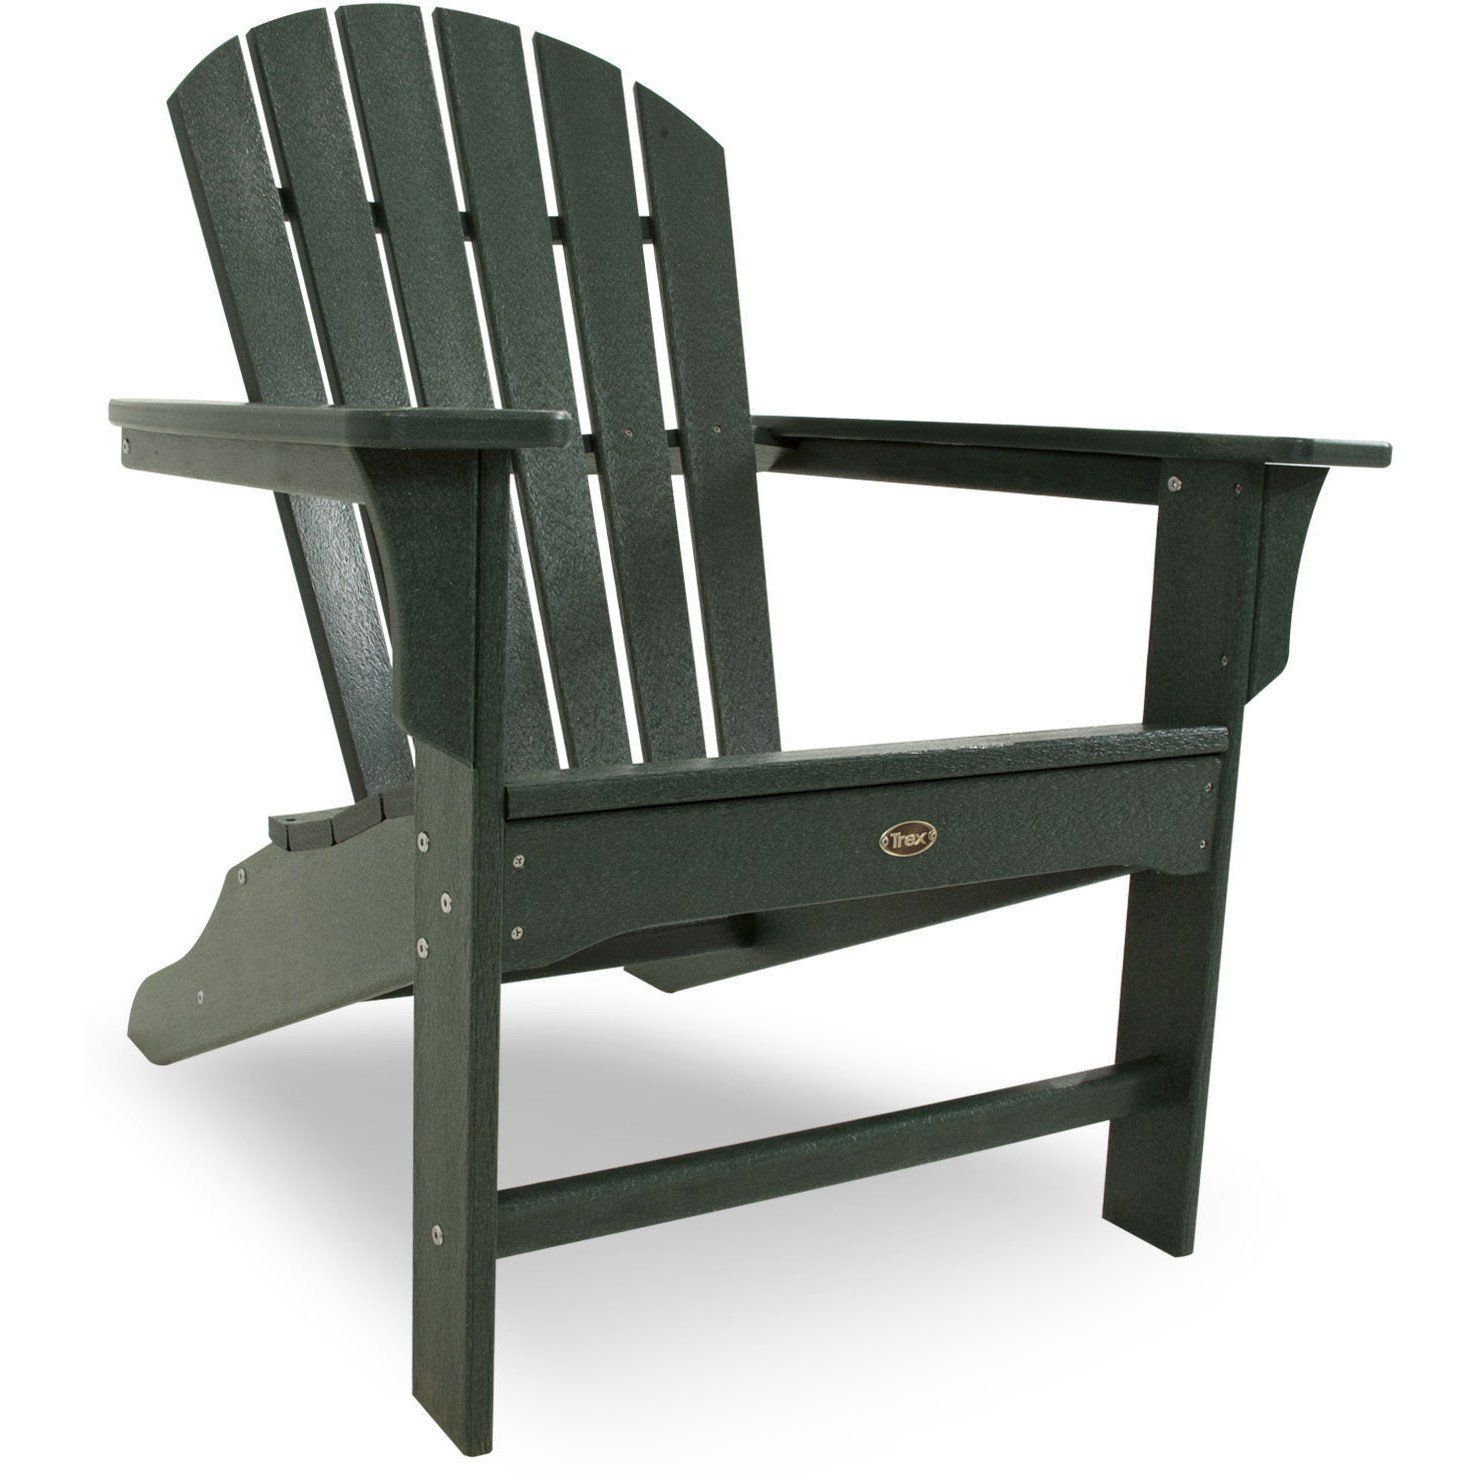 Trex Outdoor Furniture Yacht Club Shellback Adirondack